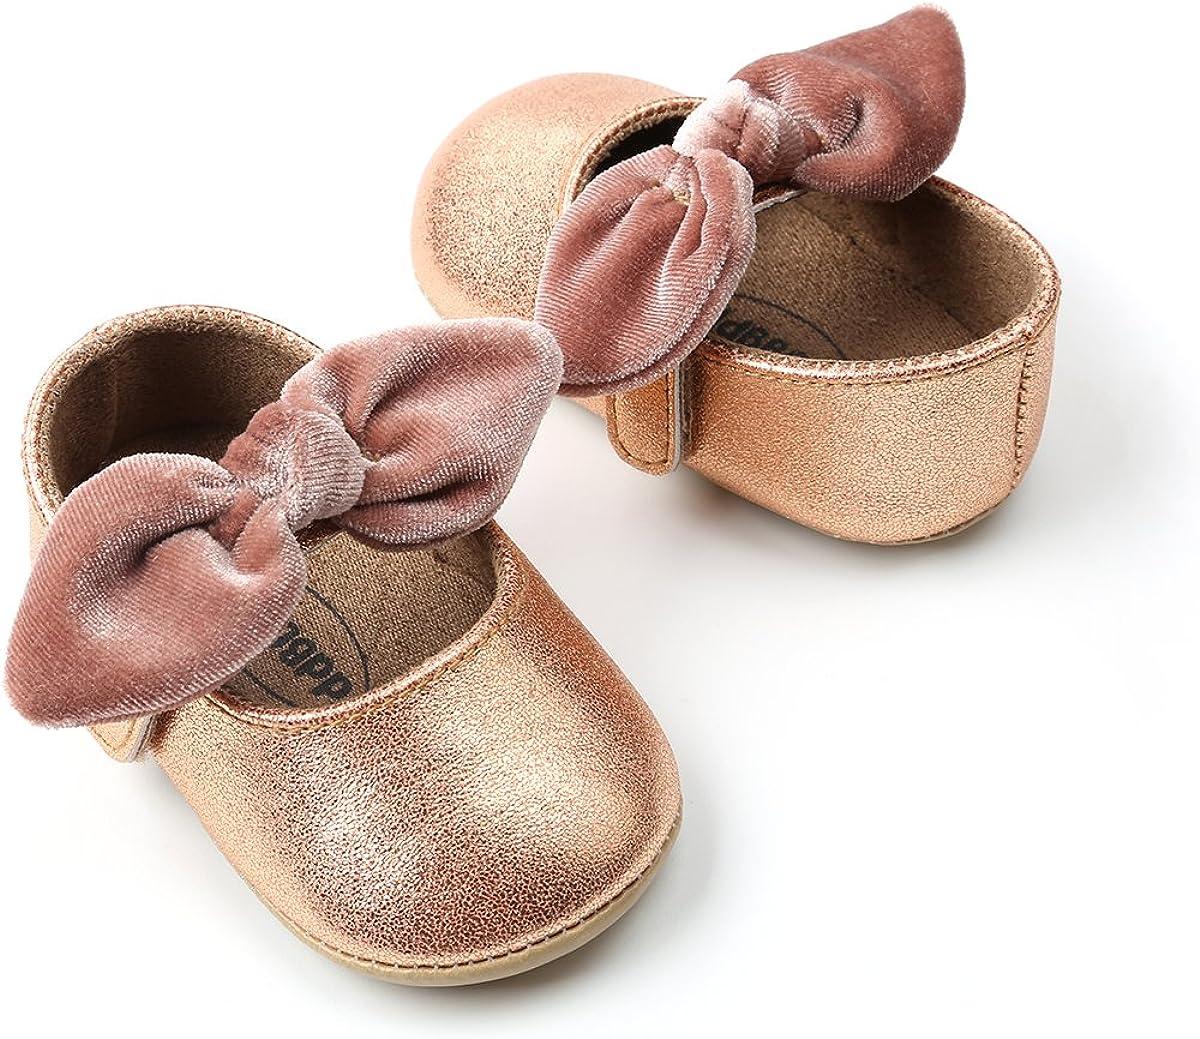 Myleleya Baby Girls Mary Jane Flats with Bowknot Flowers,Princess Wedding Dress Ballet Shoes Non-Slip Toddler First Walkers Newborn Crib Shoe